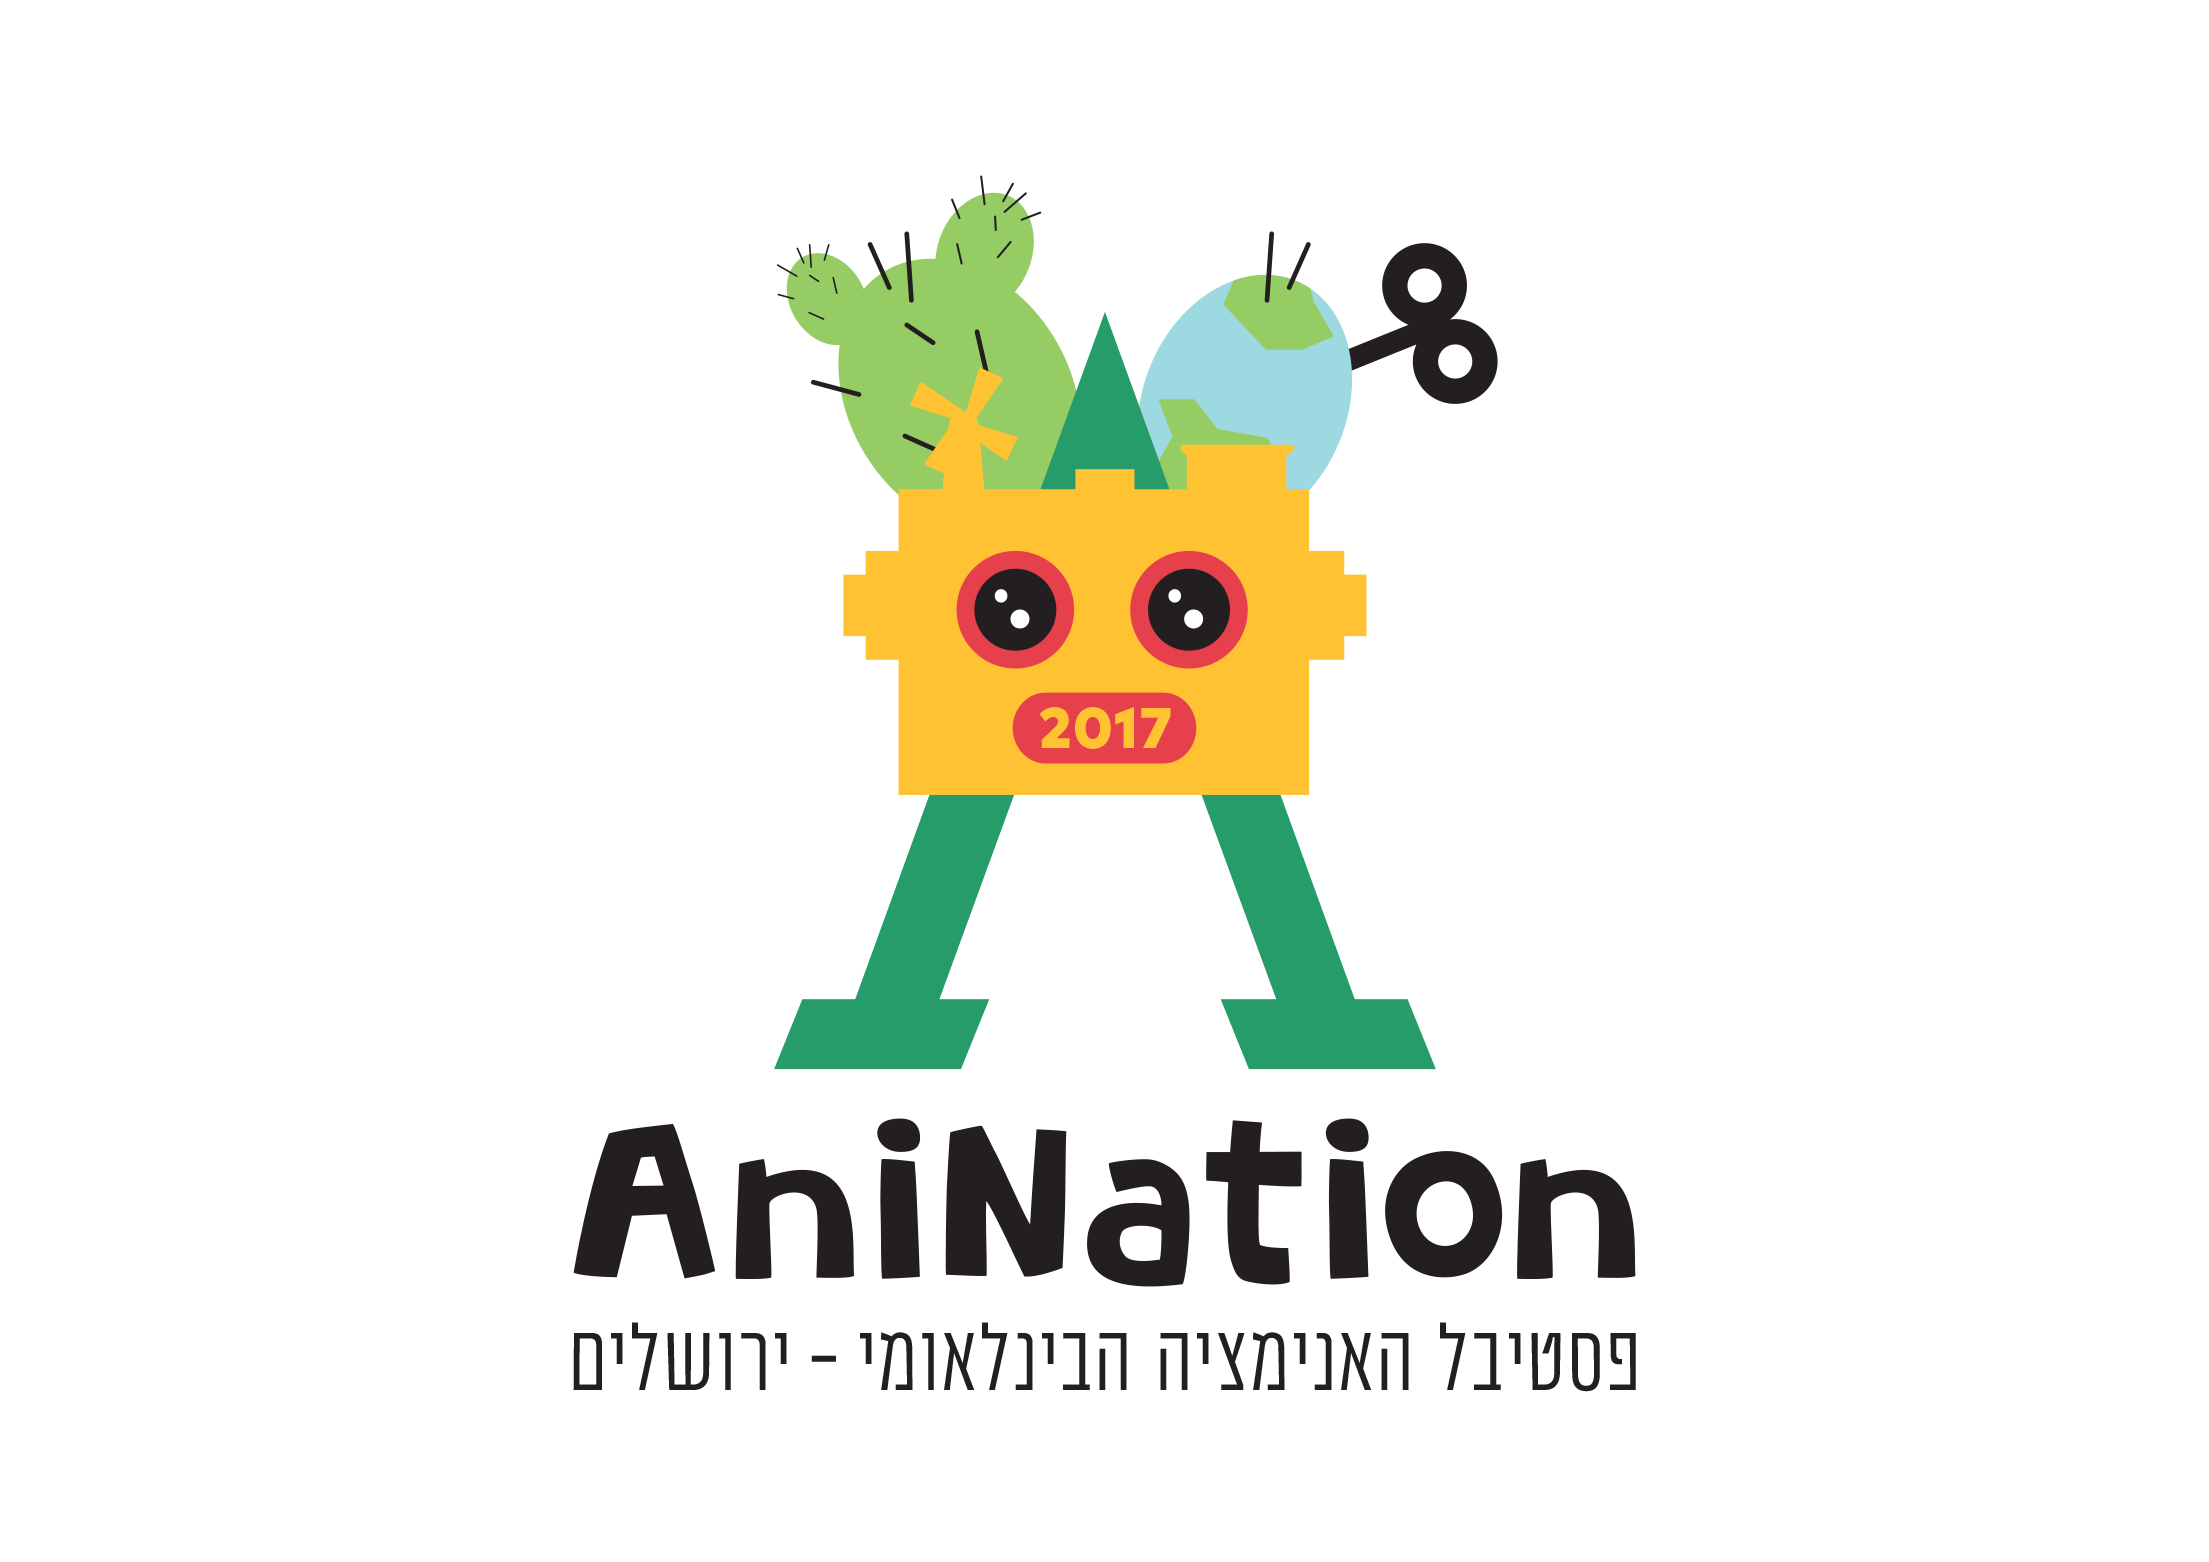 Anination2017-logo